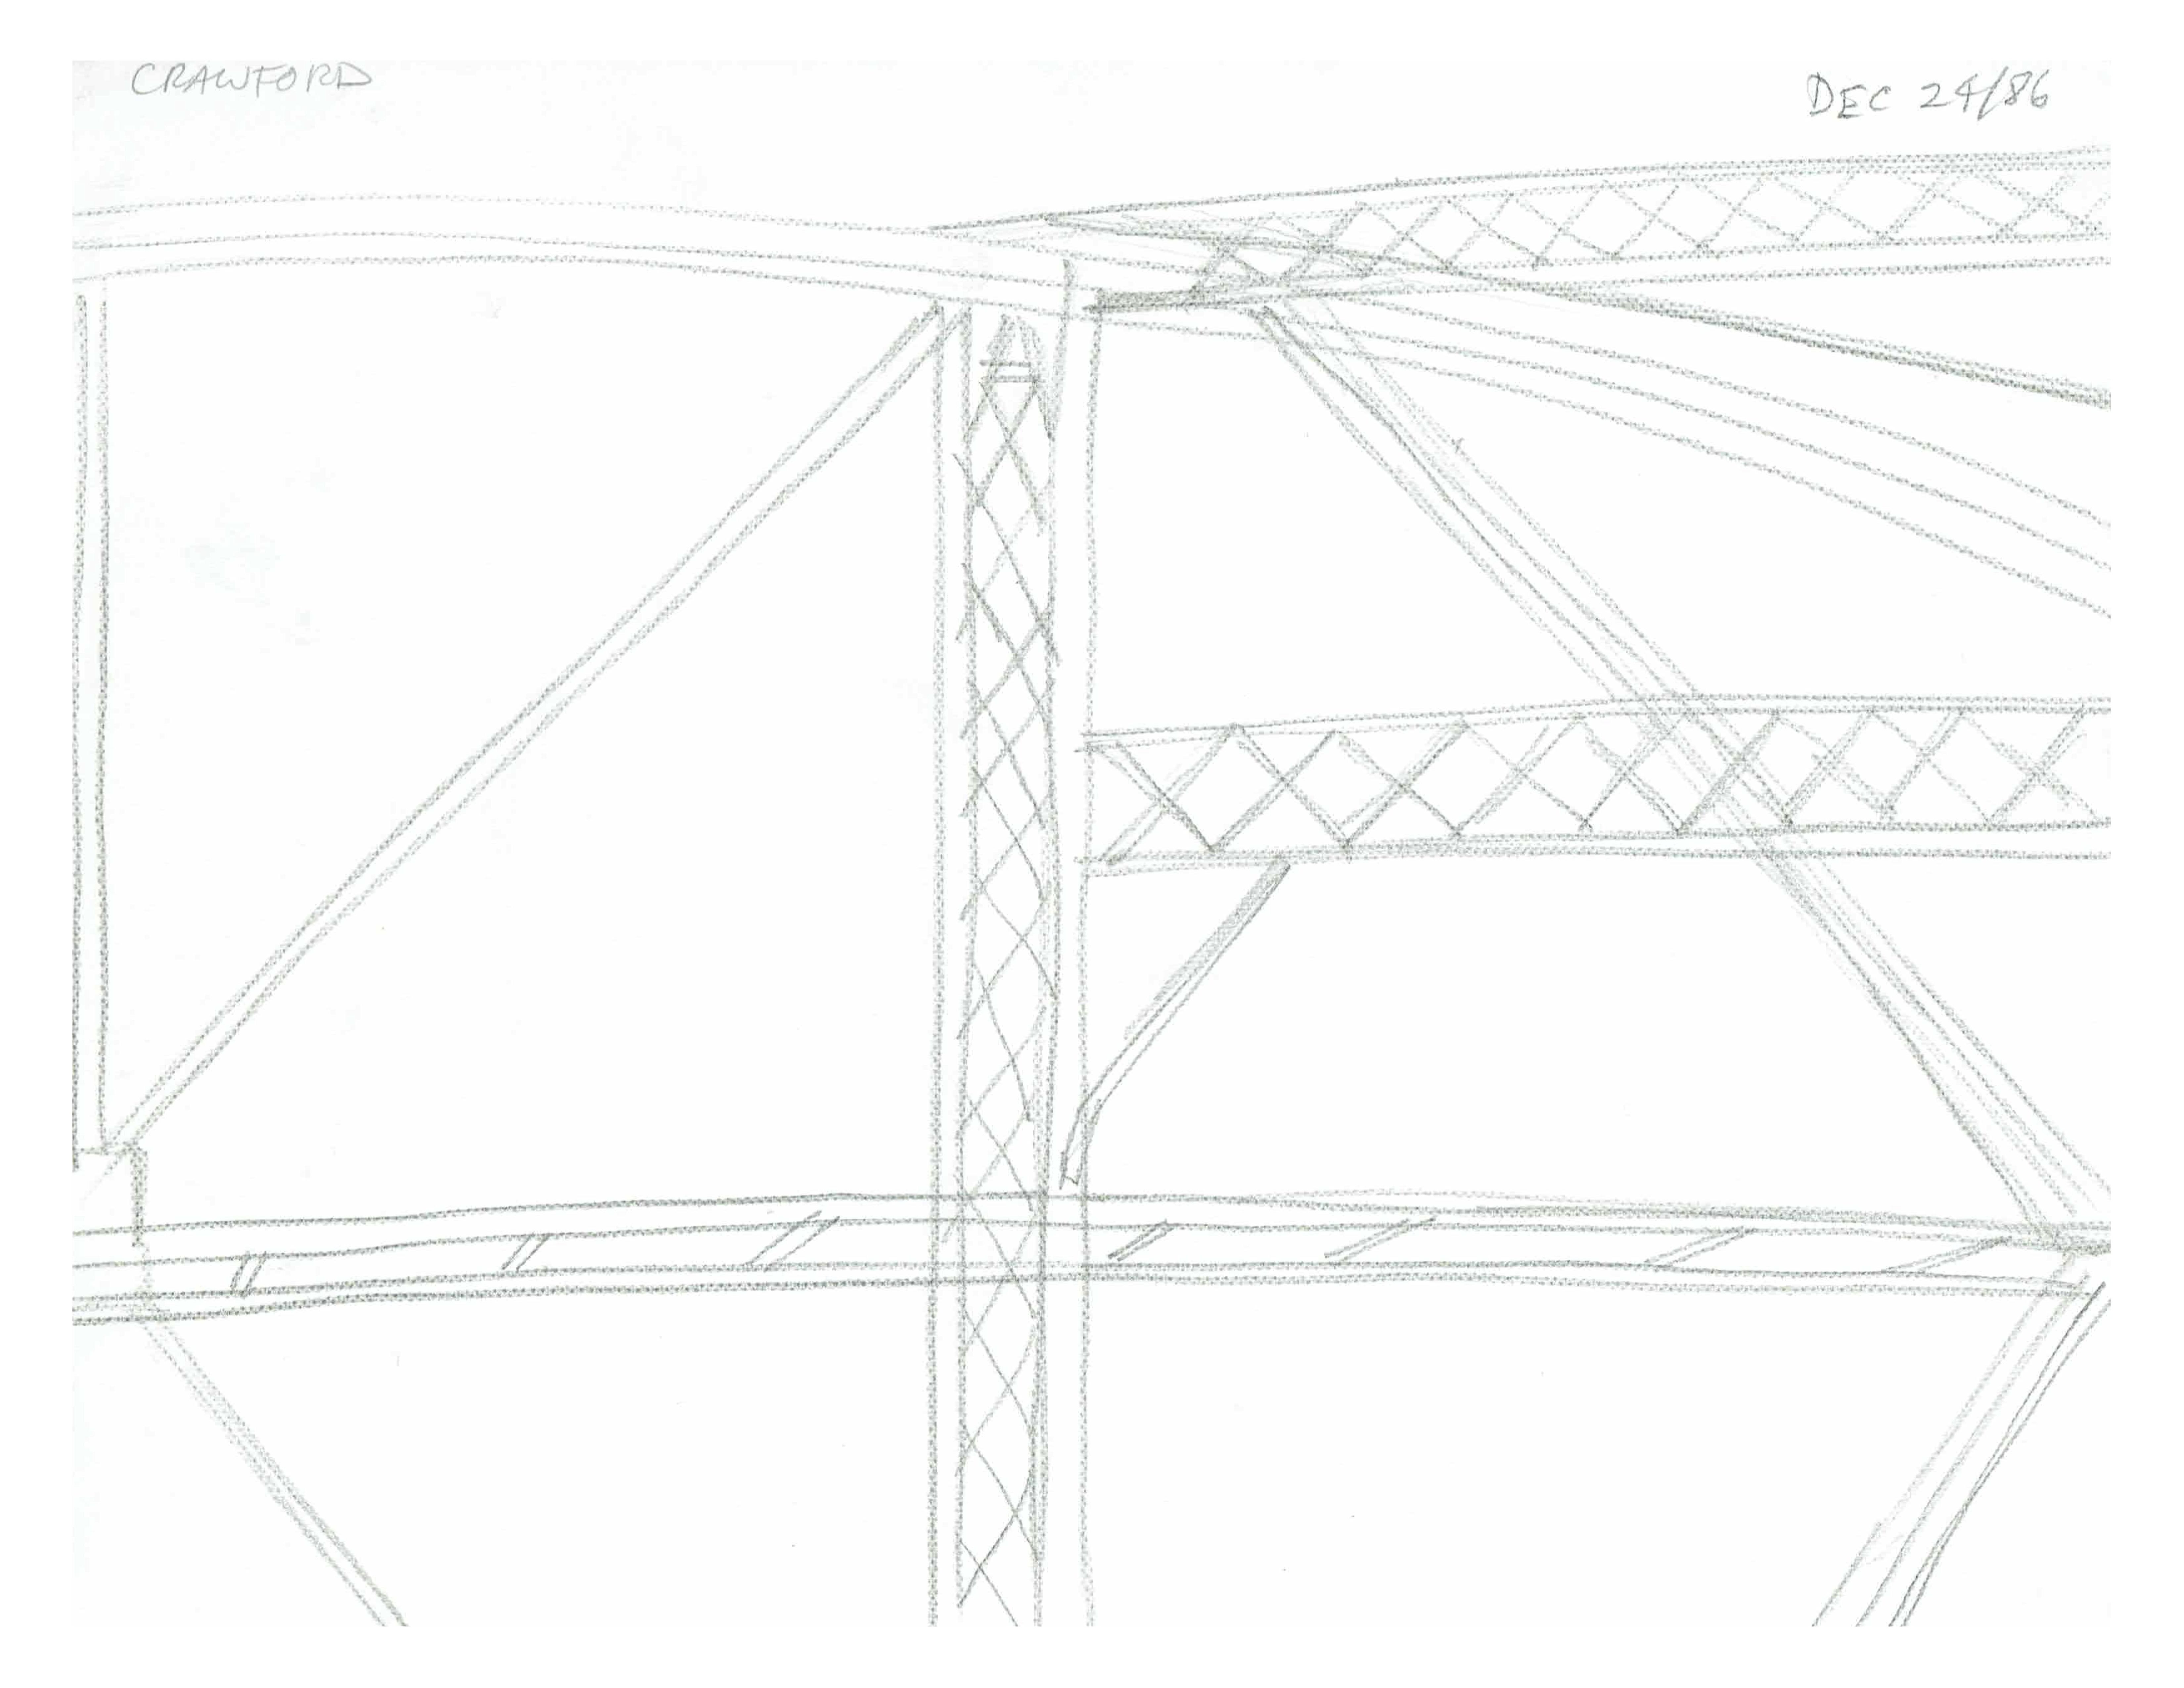 Bridge detail of supports, Dec 24, 1986, pencil on paper, 21.6 cmx 28 cm